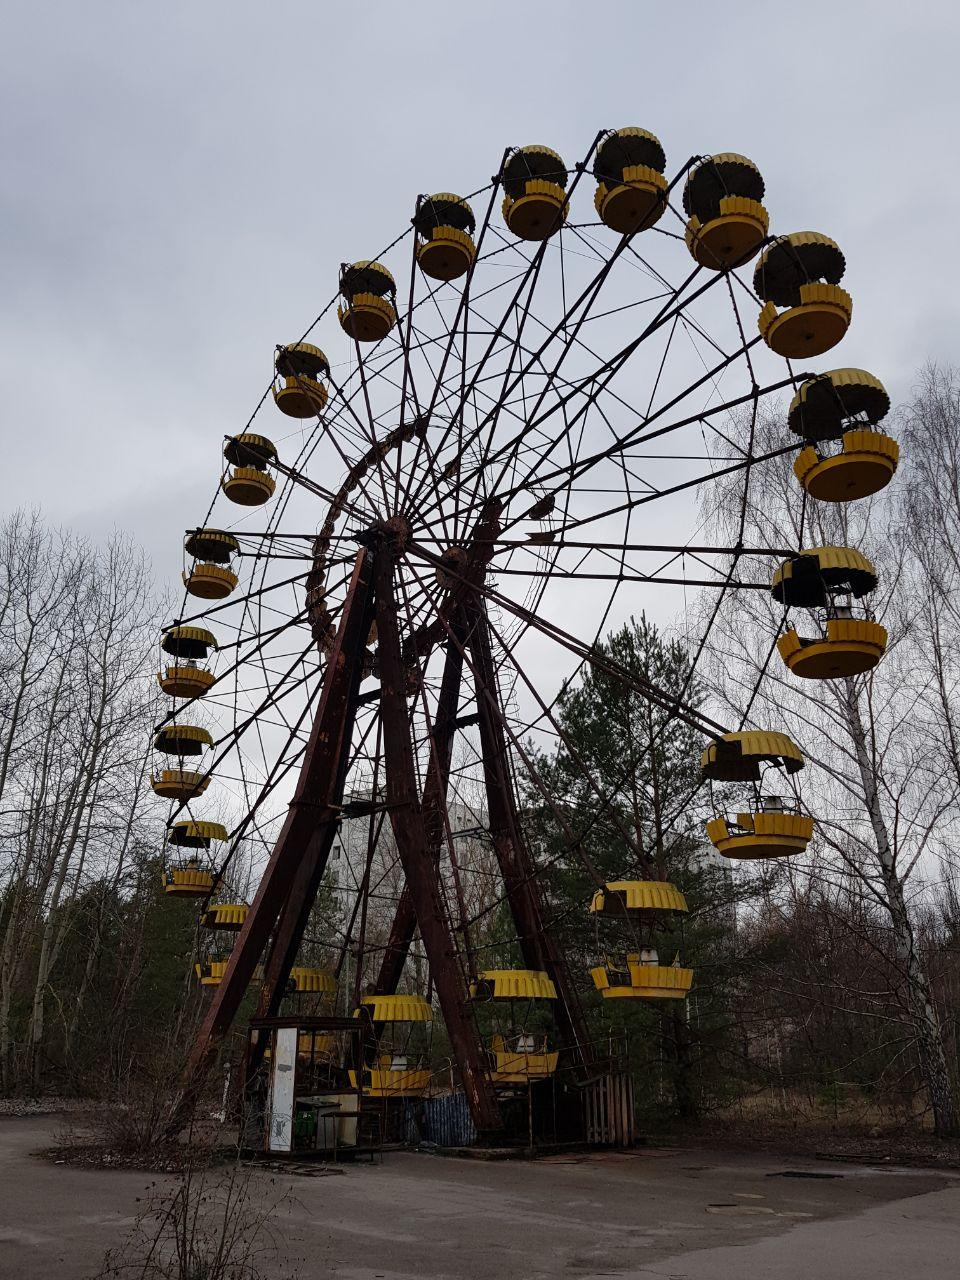 realchernobyl tour